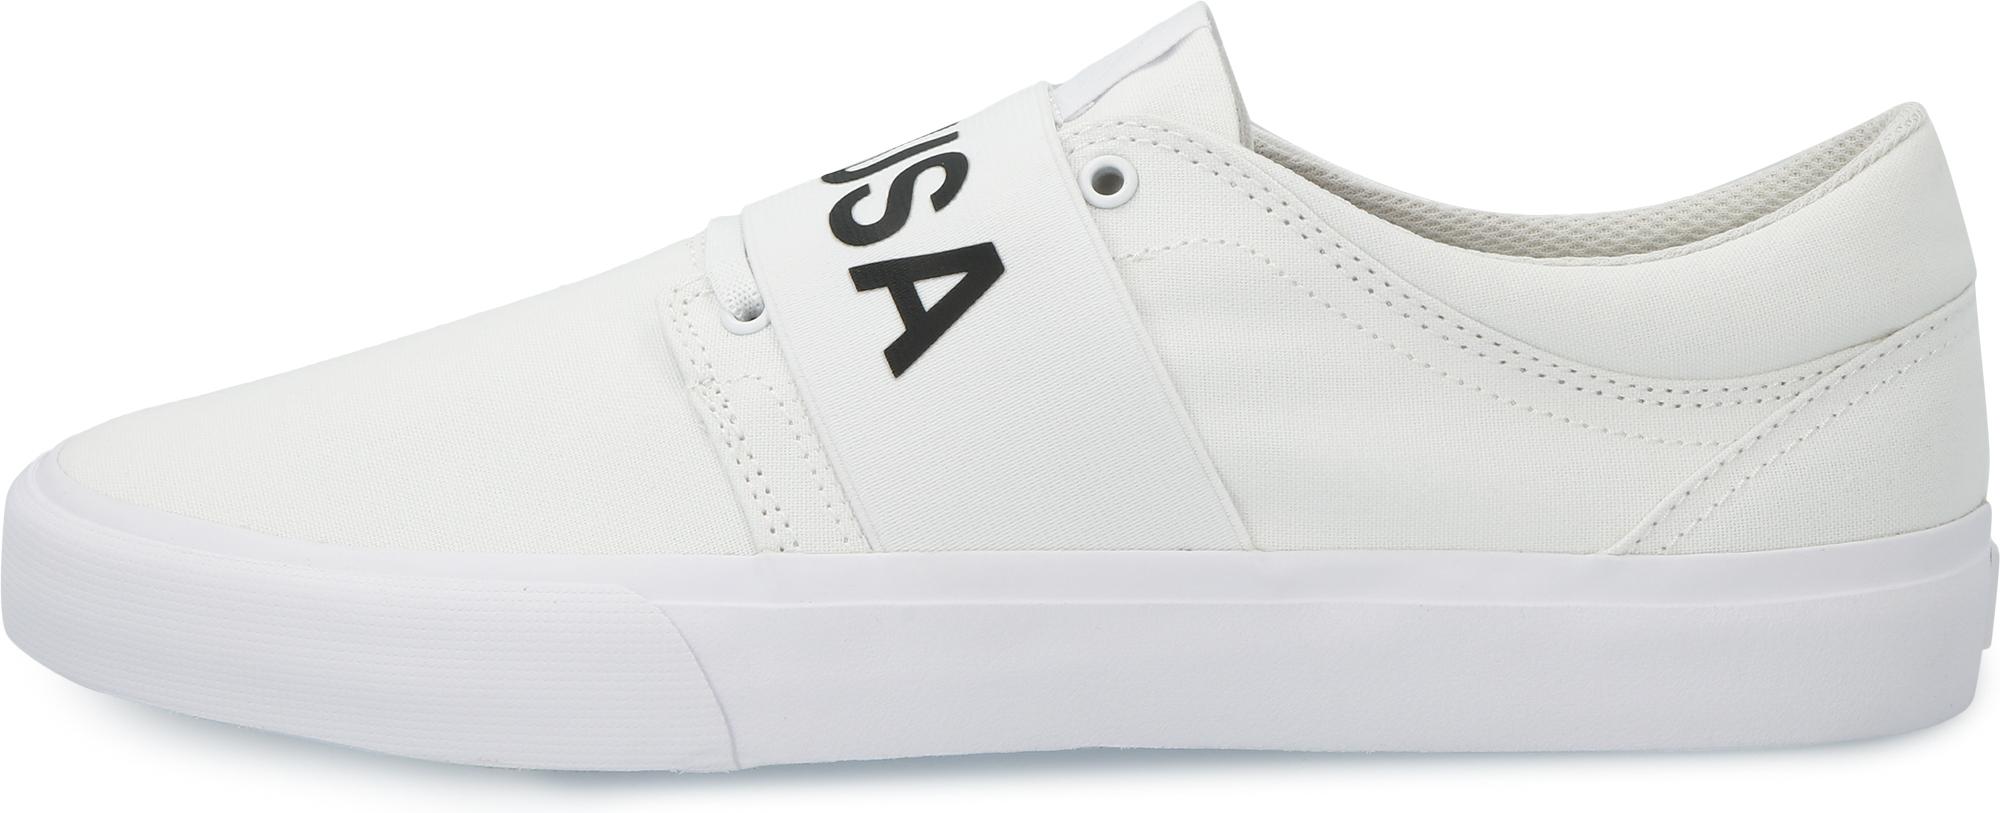 Фото - DC SHOES Кеды мужские DC SHOES TraSE TX SP, размер 39.5 футболка dc shoes dc shoes dc329emedca4